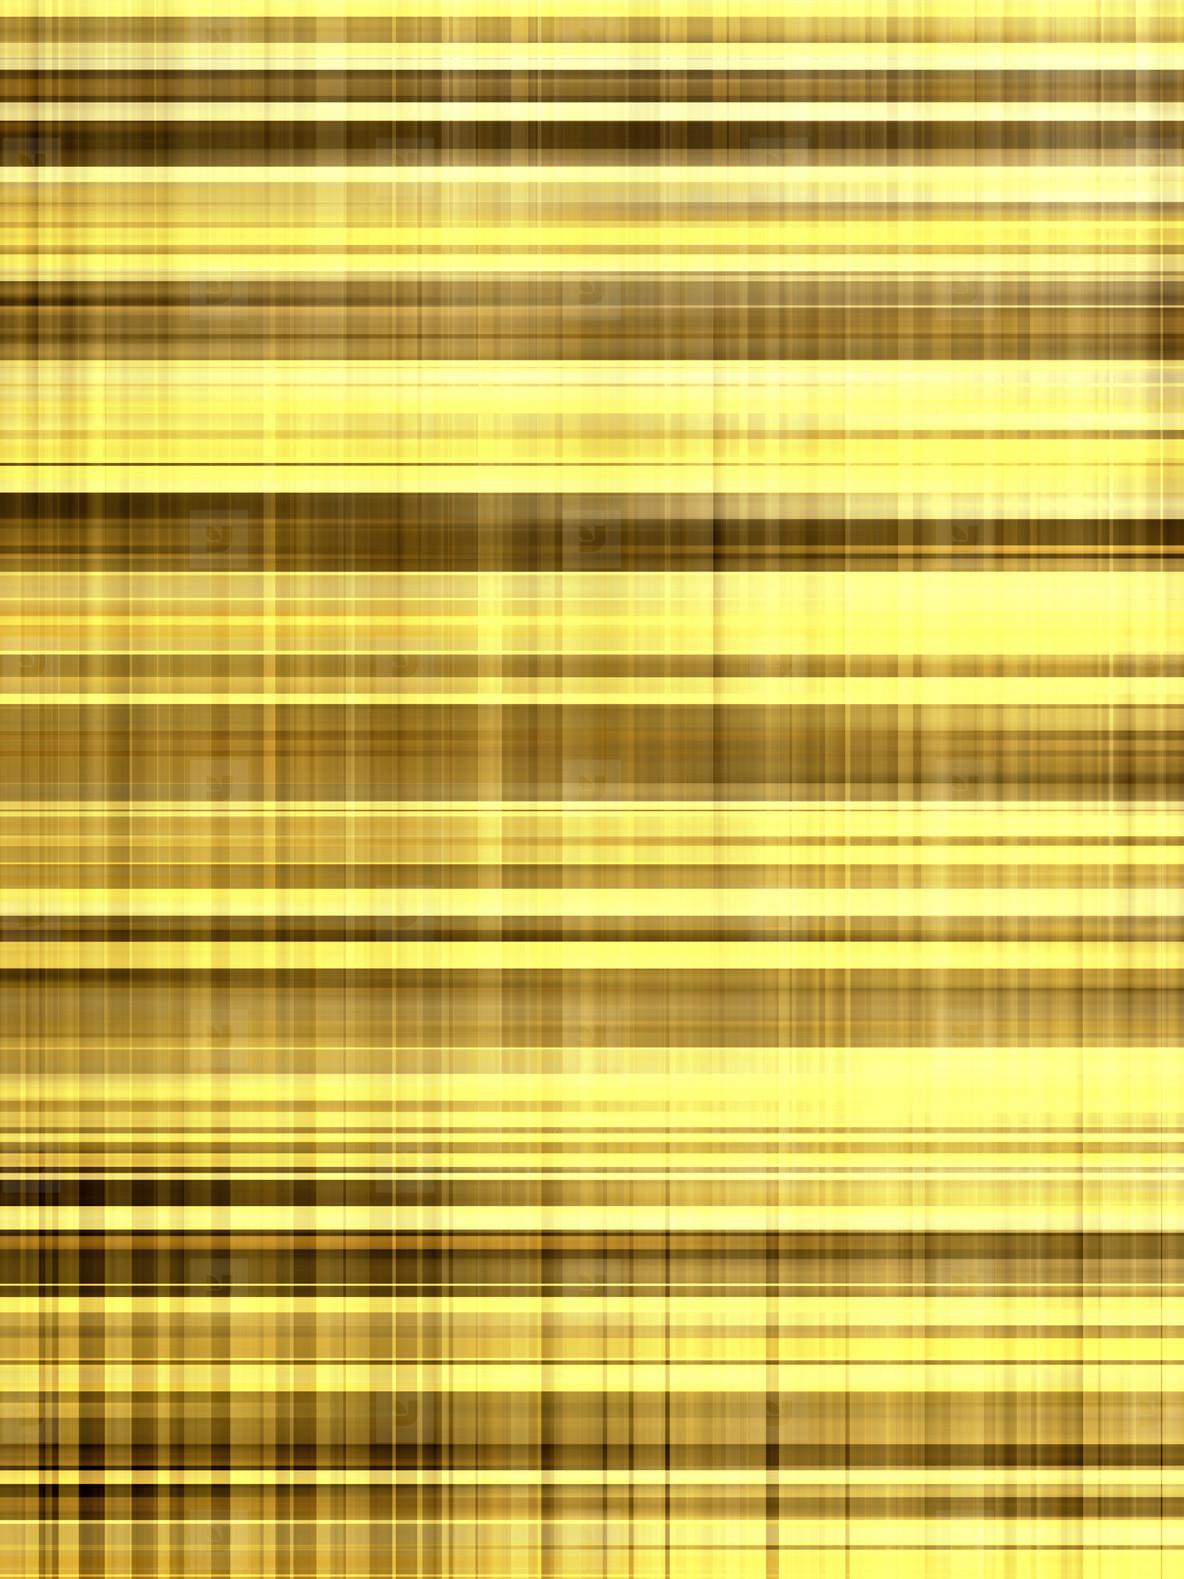 Cross blur background